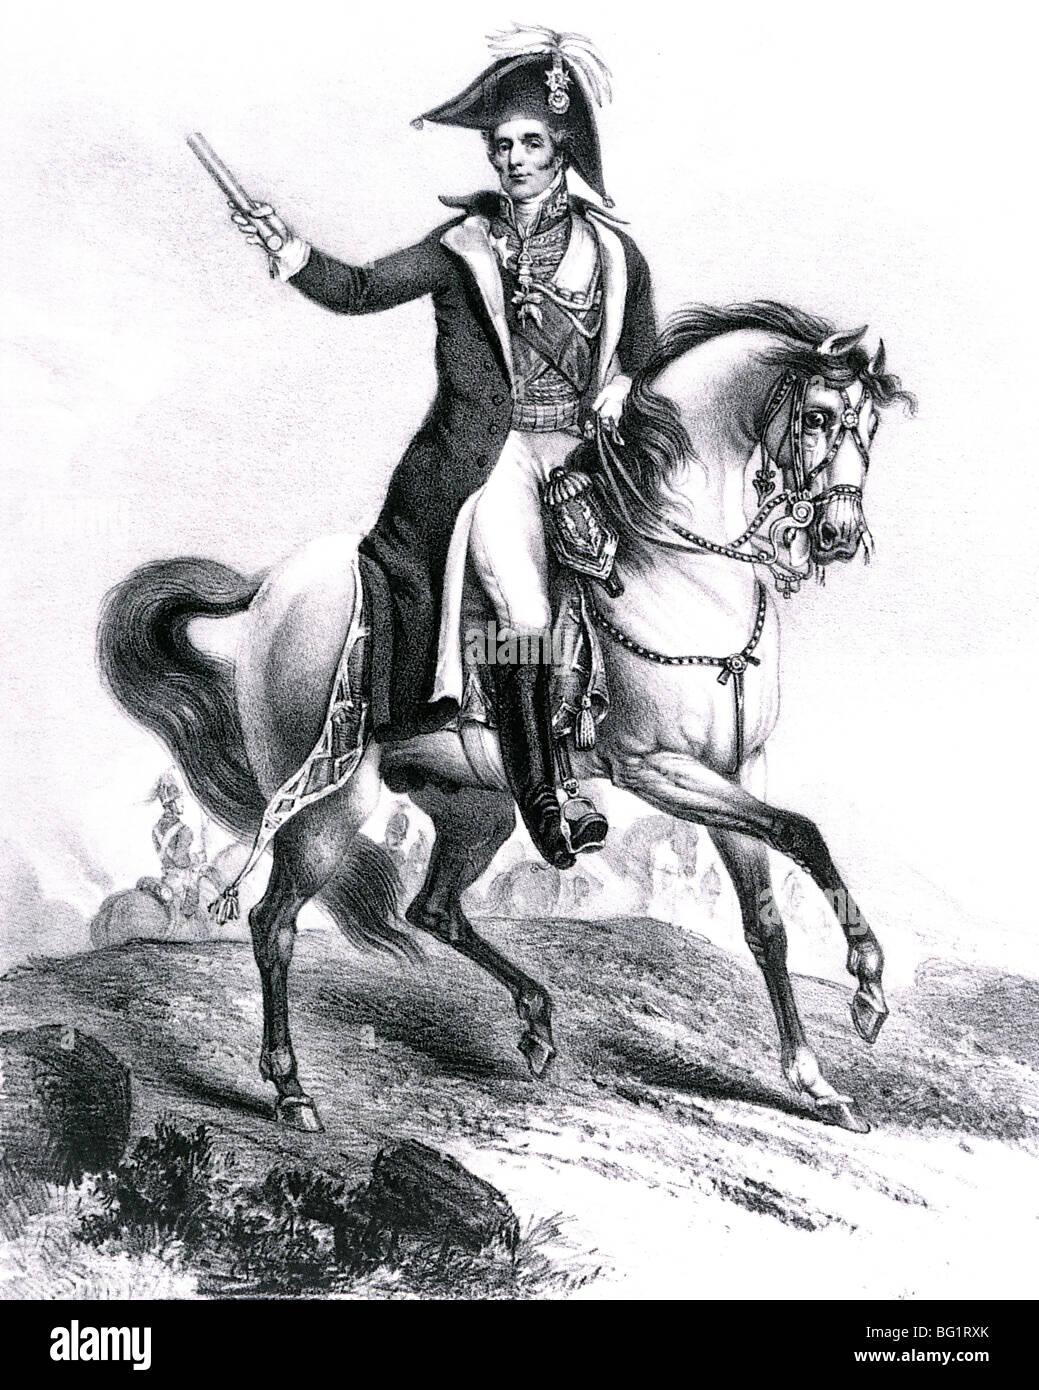 ARTHUR WELLESLEY, 1st DUKE OF WELLINGTON  (1769-1852) Irish-born soldier and statesman - Stock Image